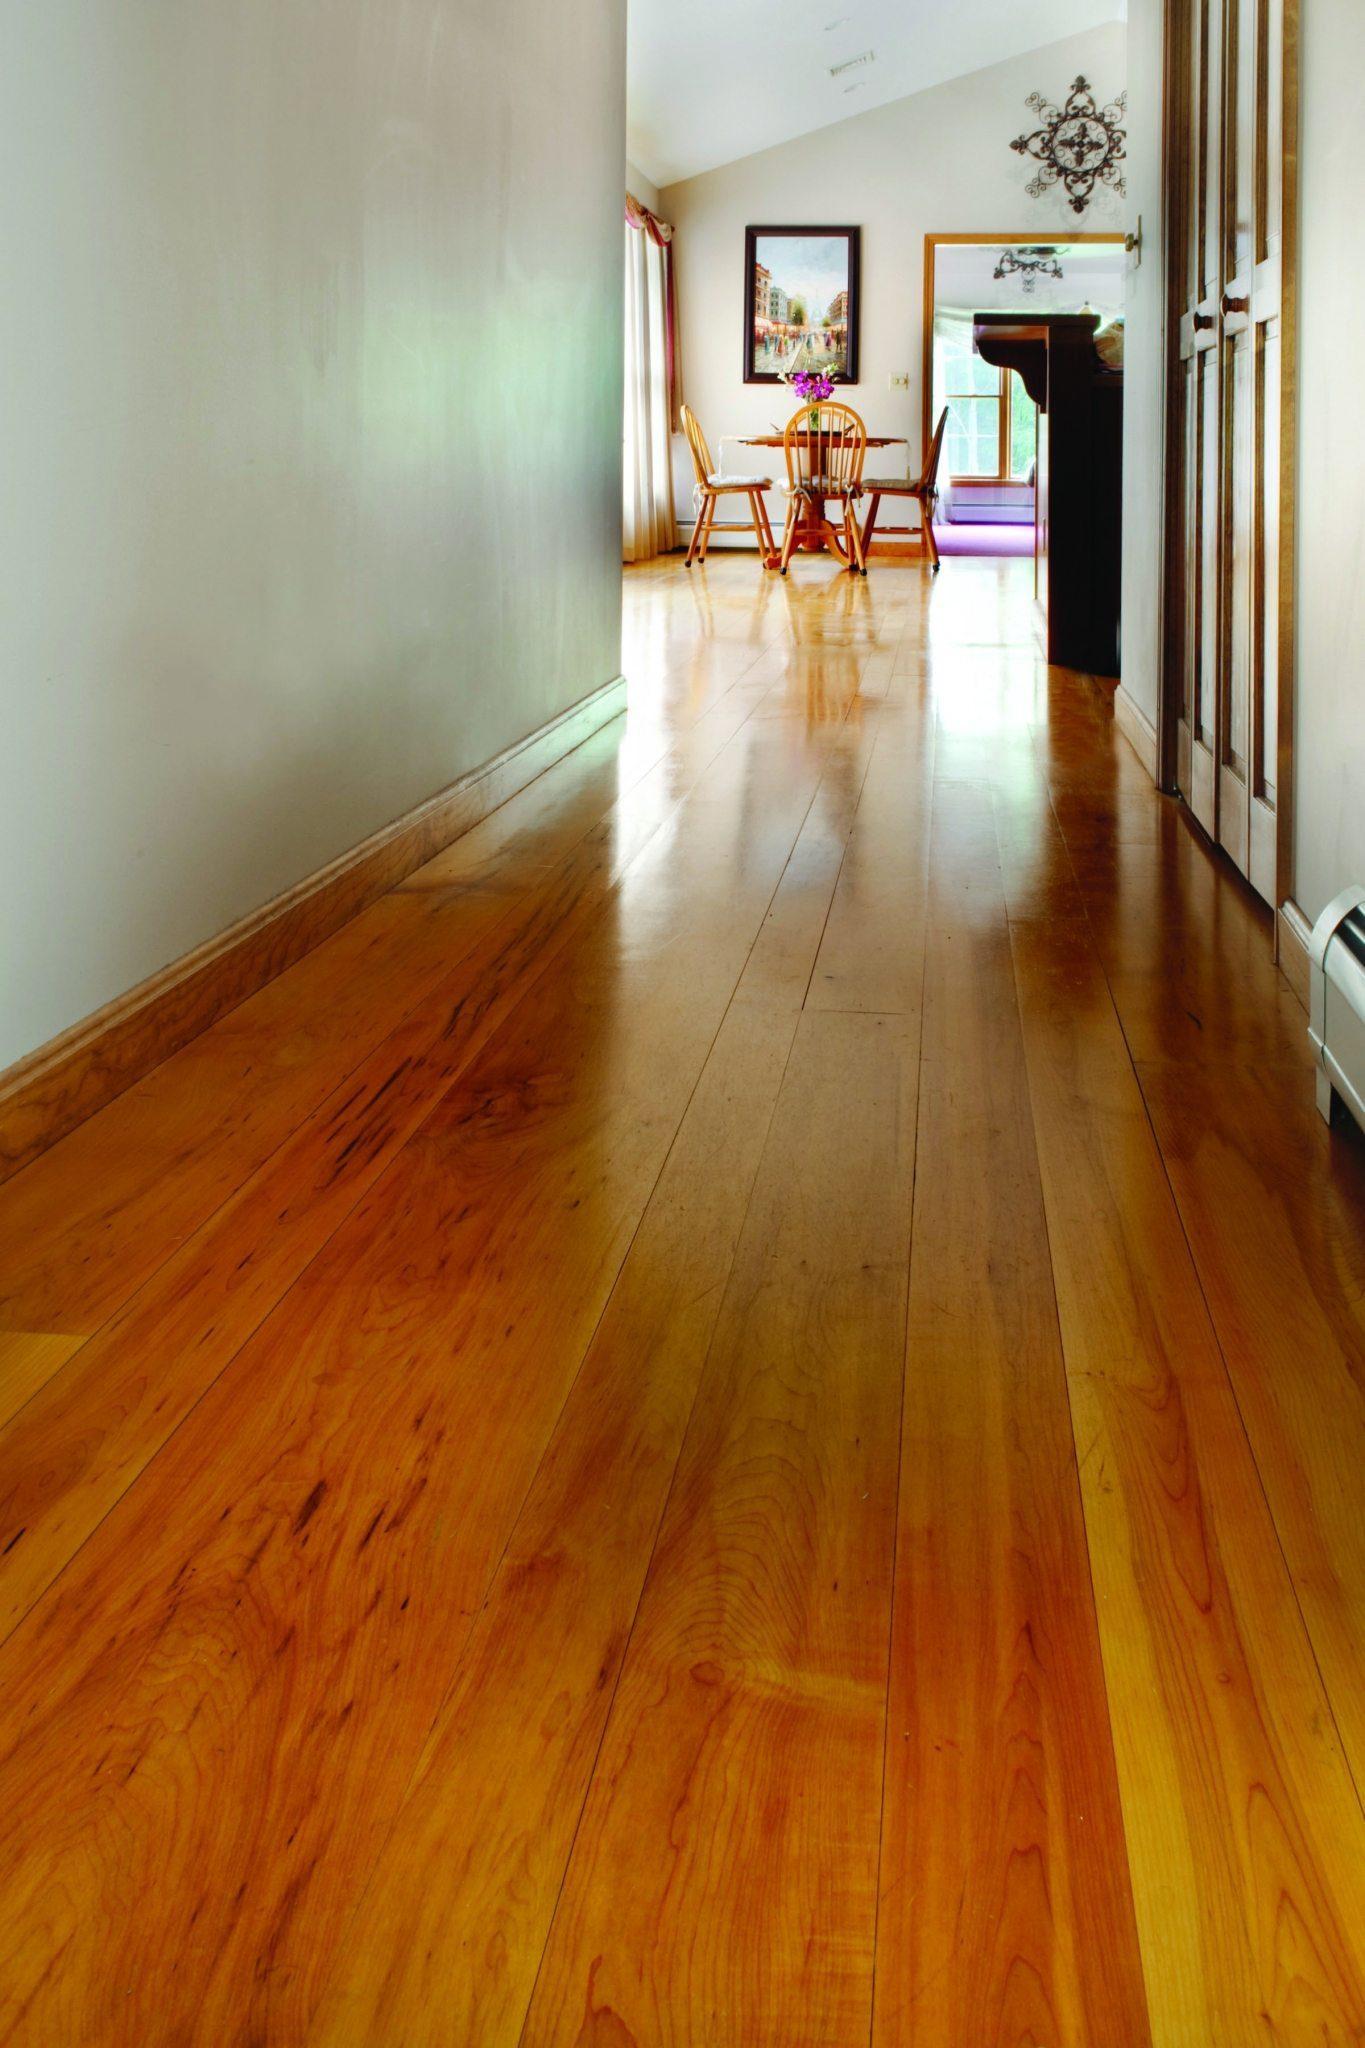 Brown Maple Hardwood Flooring In Hallway